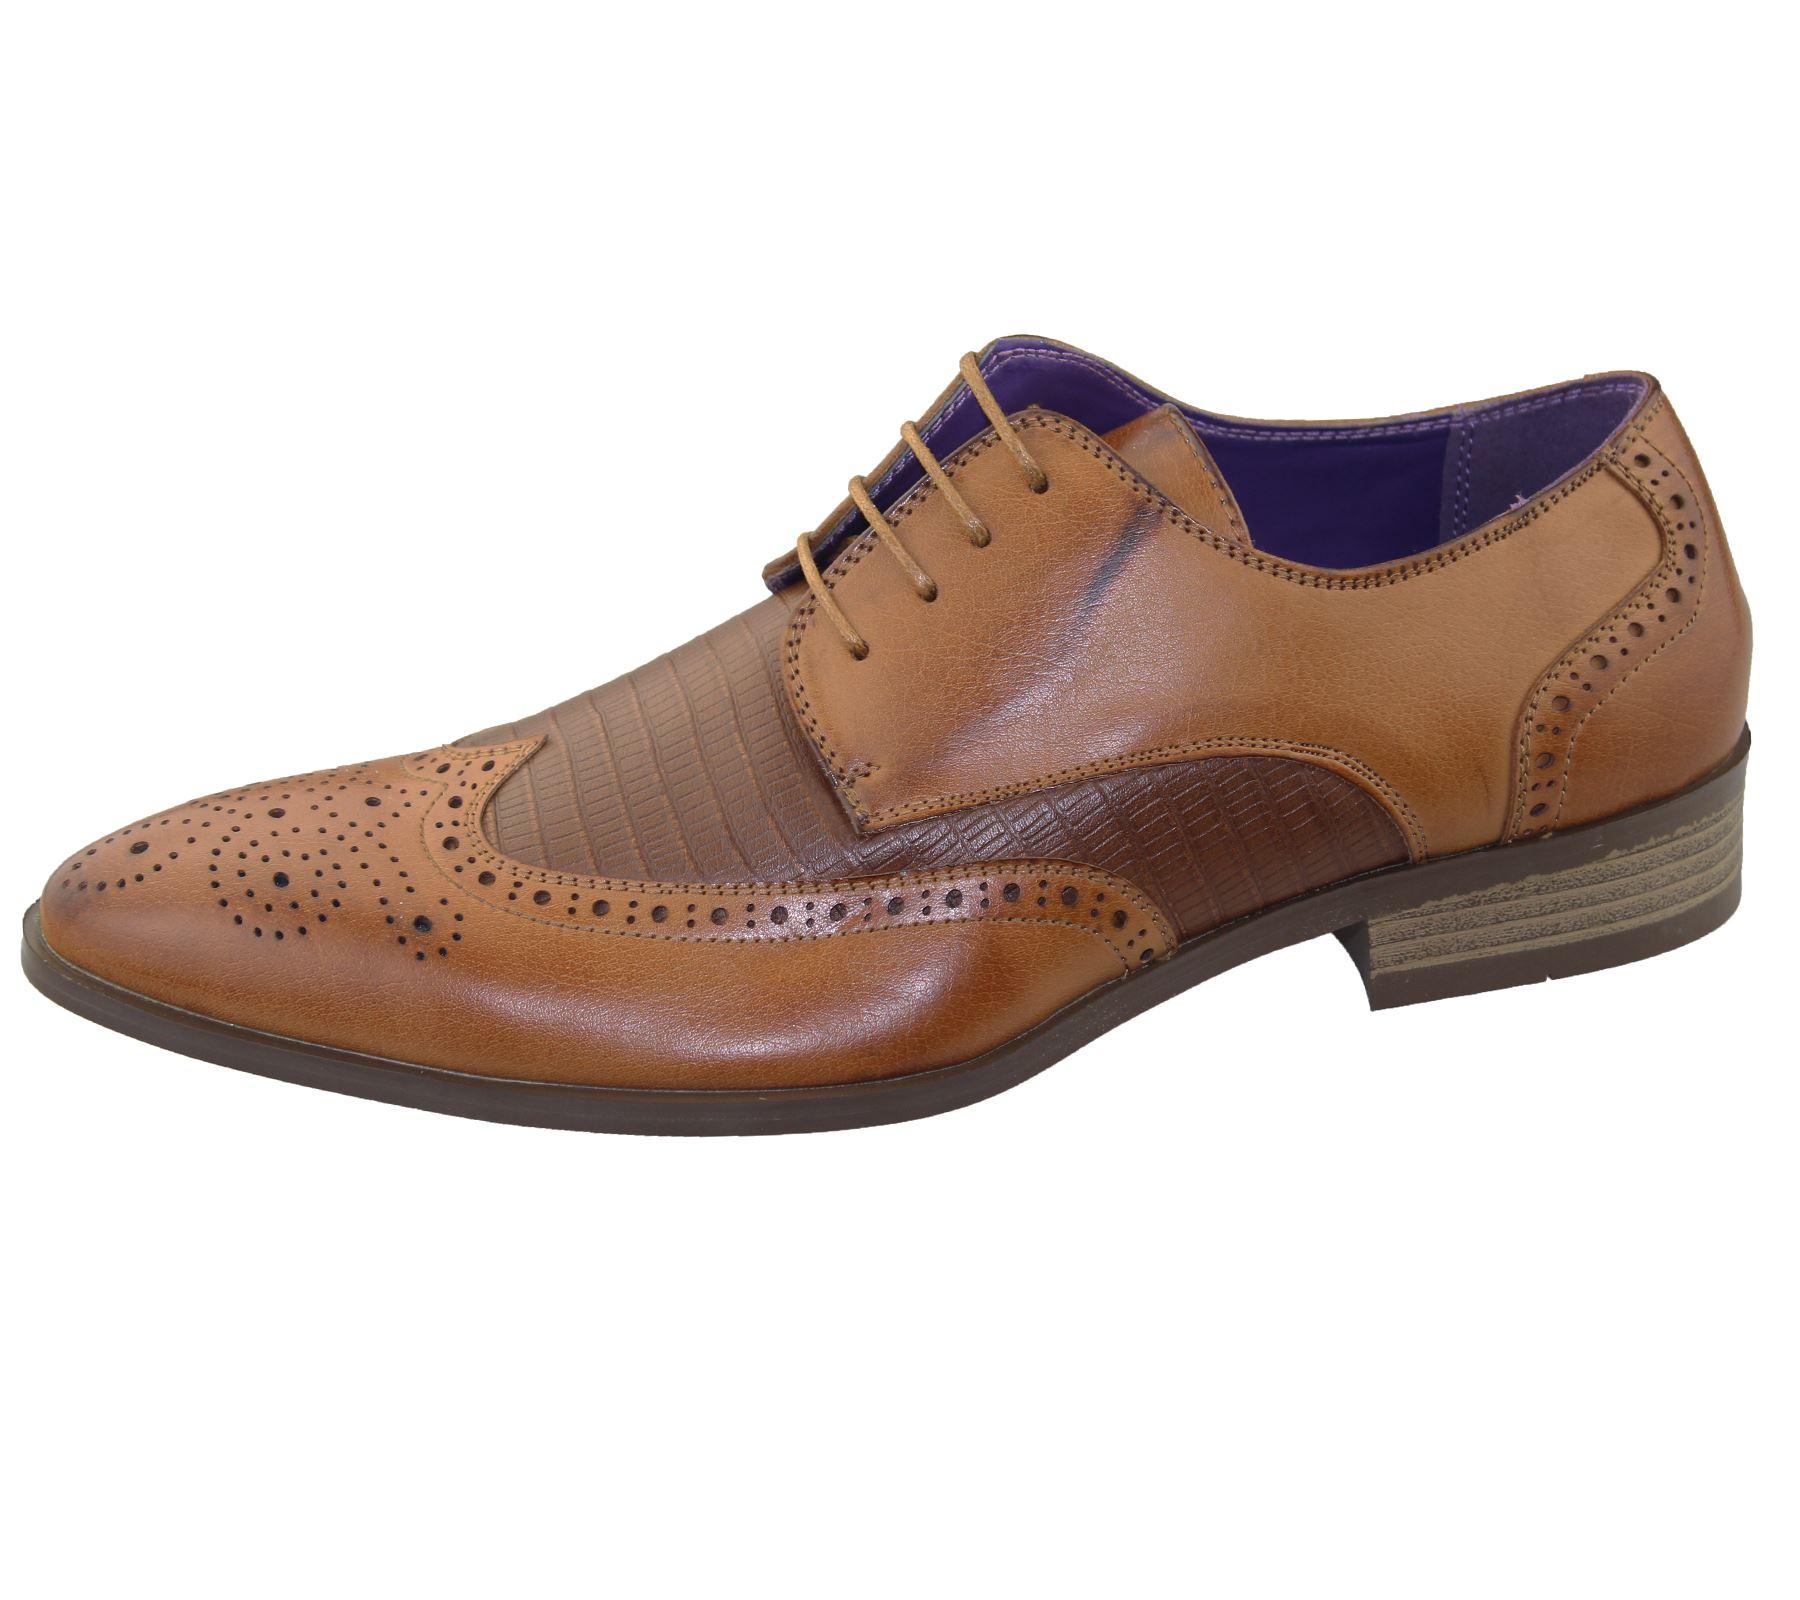 mens brogue shoes office wedding casual formal smart dress